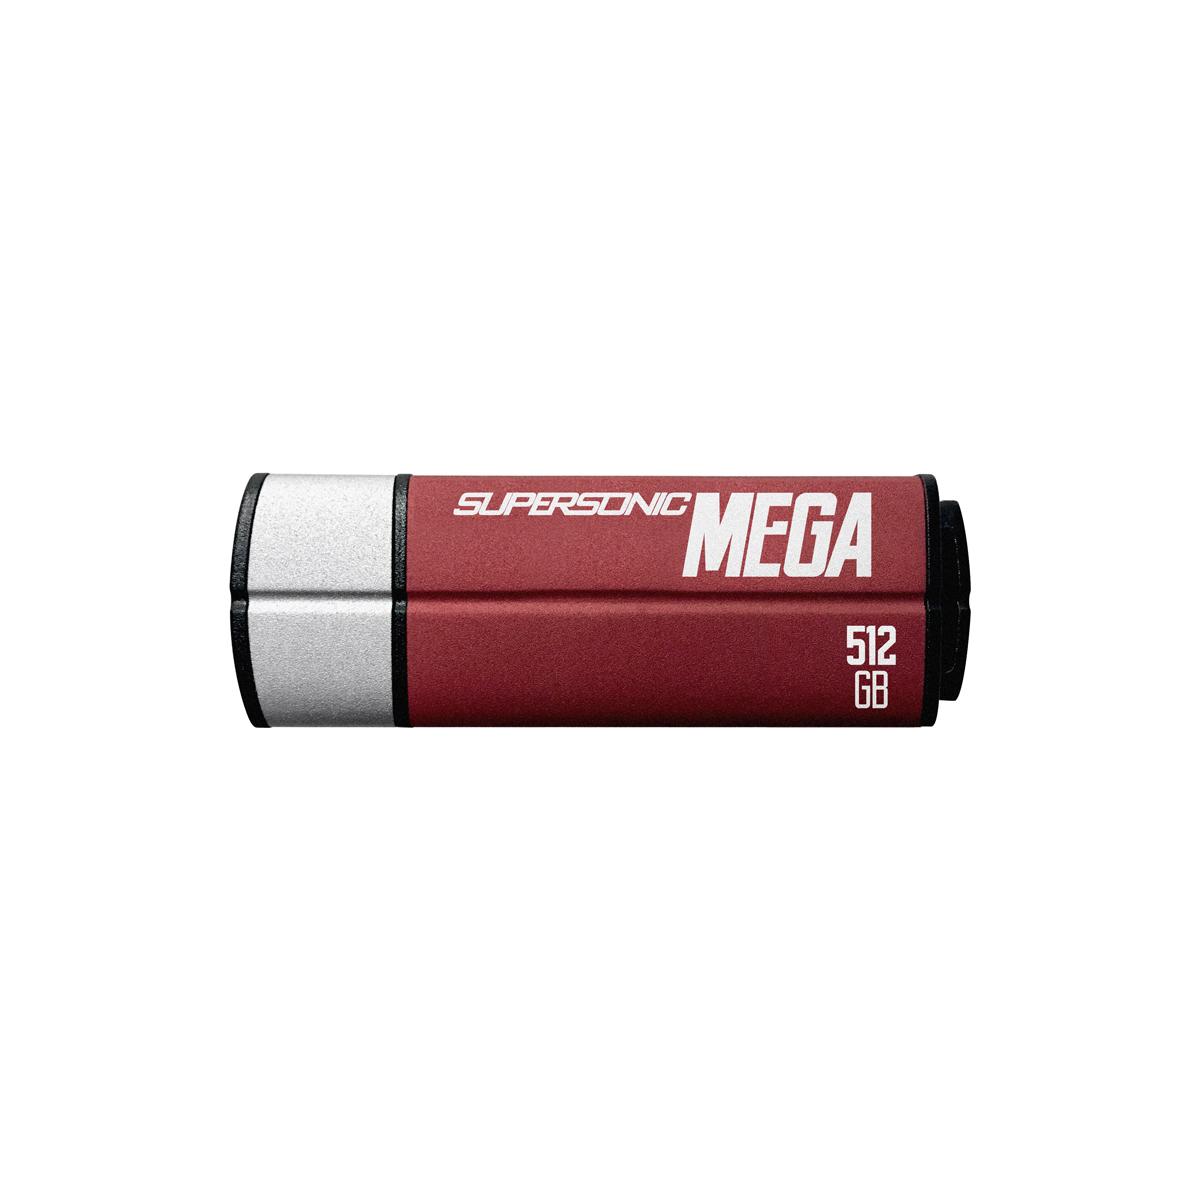 Flash disk Patriot Mega 512GB USB 3.1